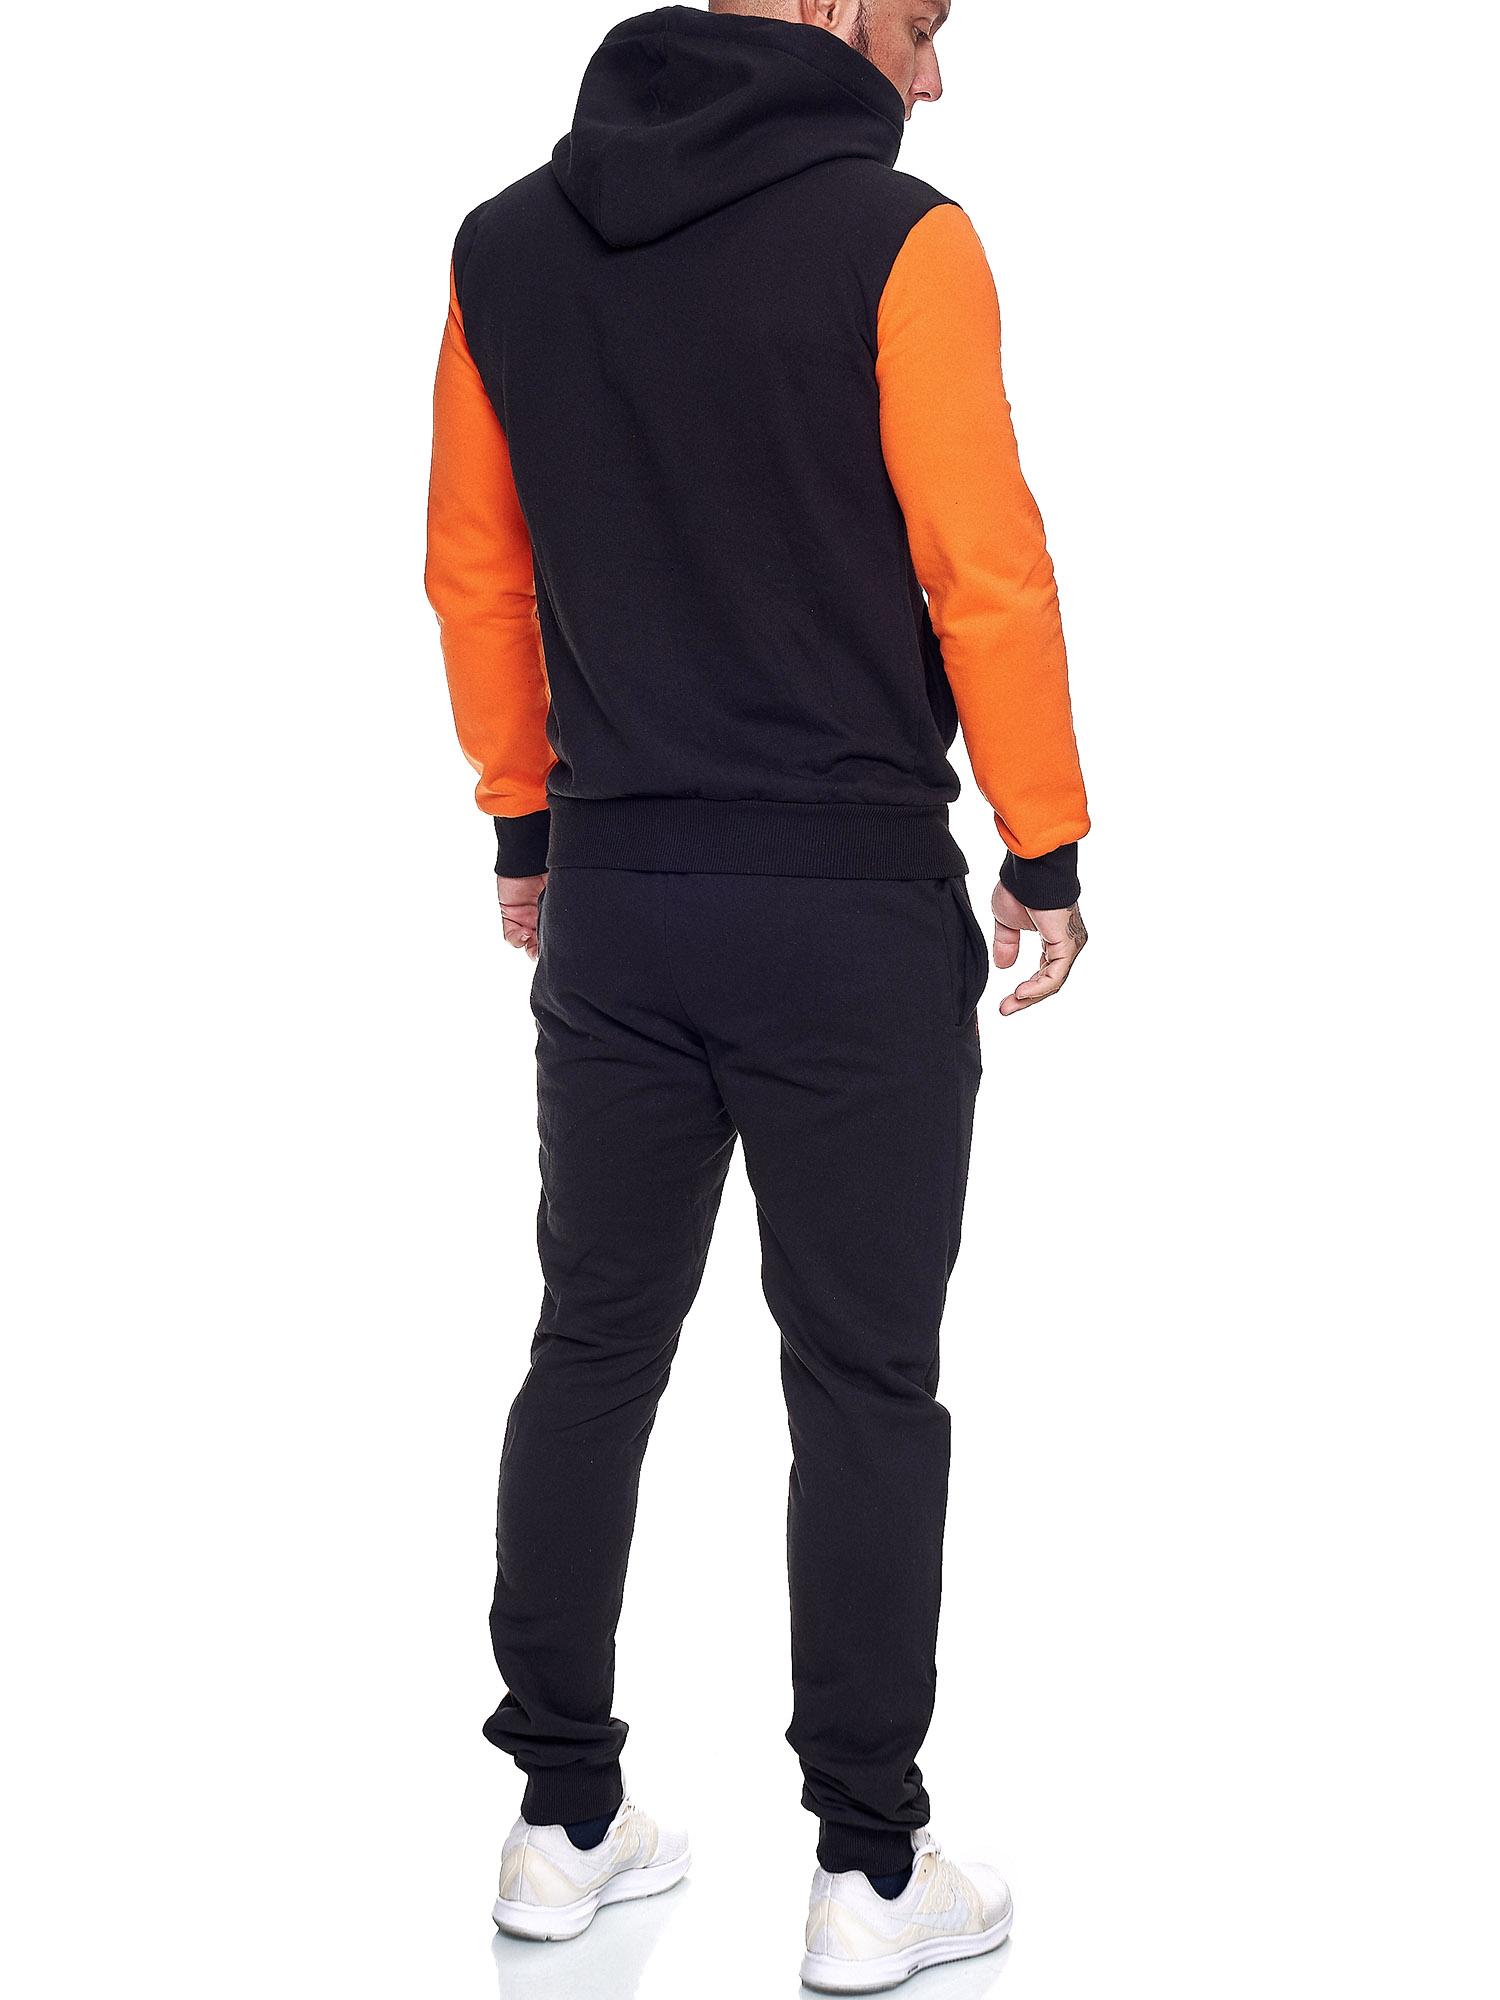 Damen-Jogginganzug-Frauen-Trainingsanzug-Sportanzug-Streetwear-JG-512-John-Kayna Indexbild 33